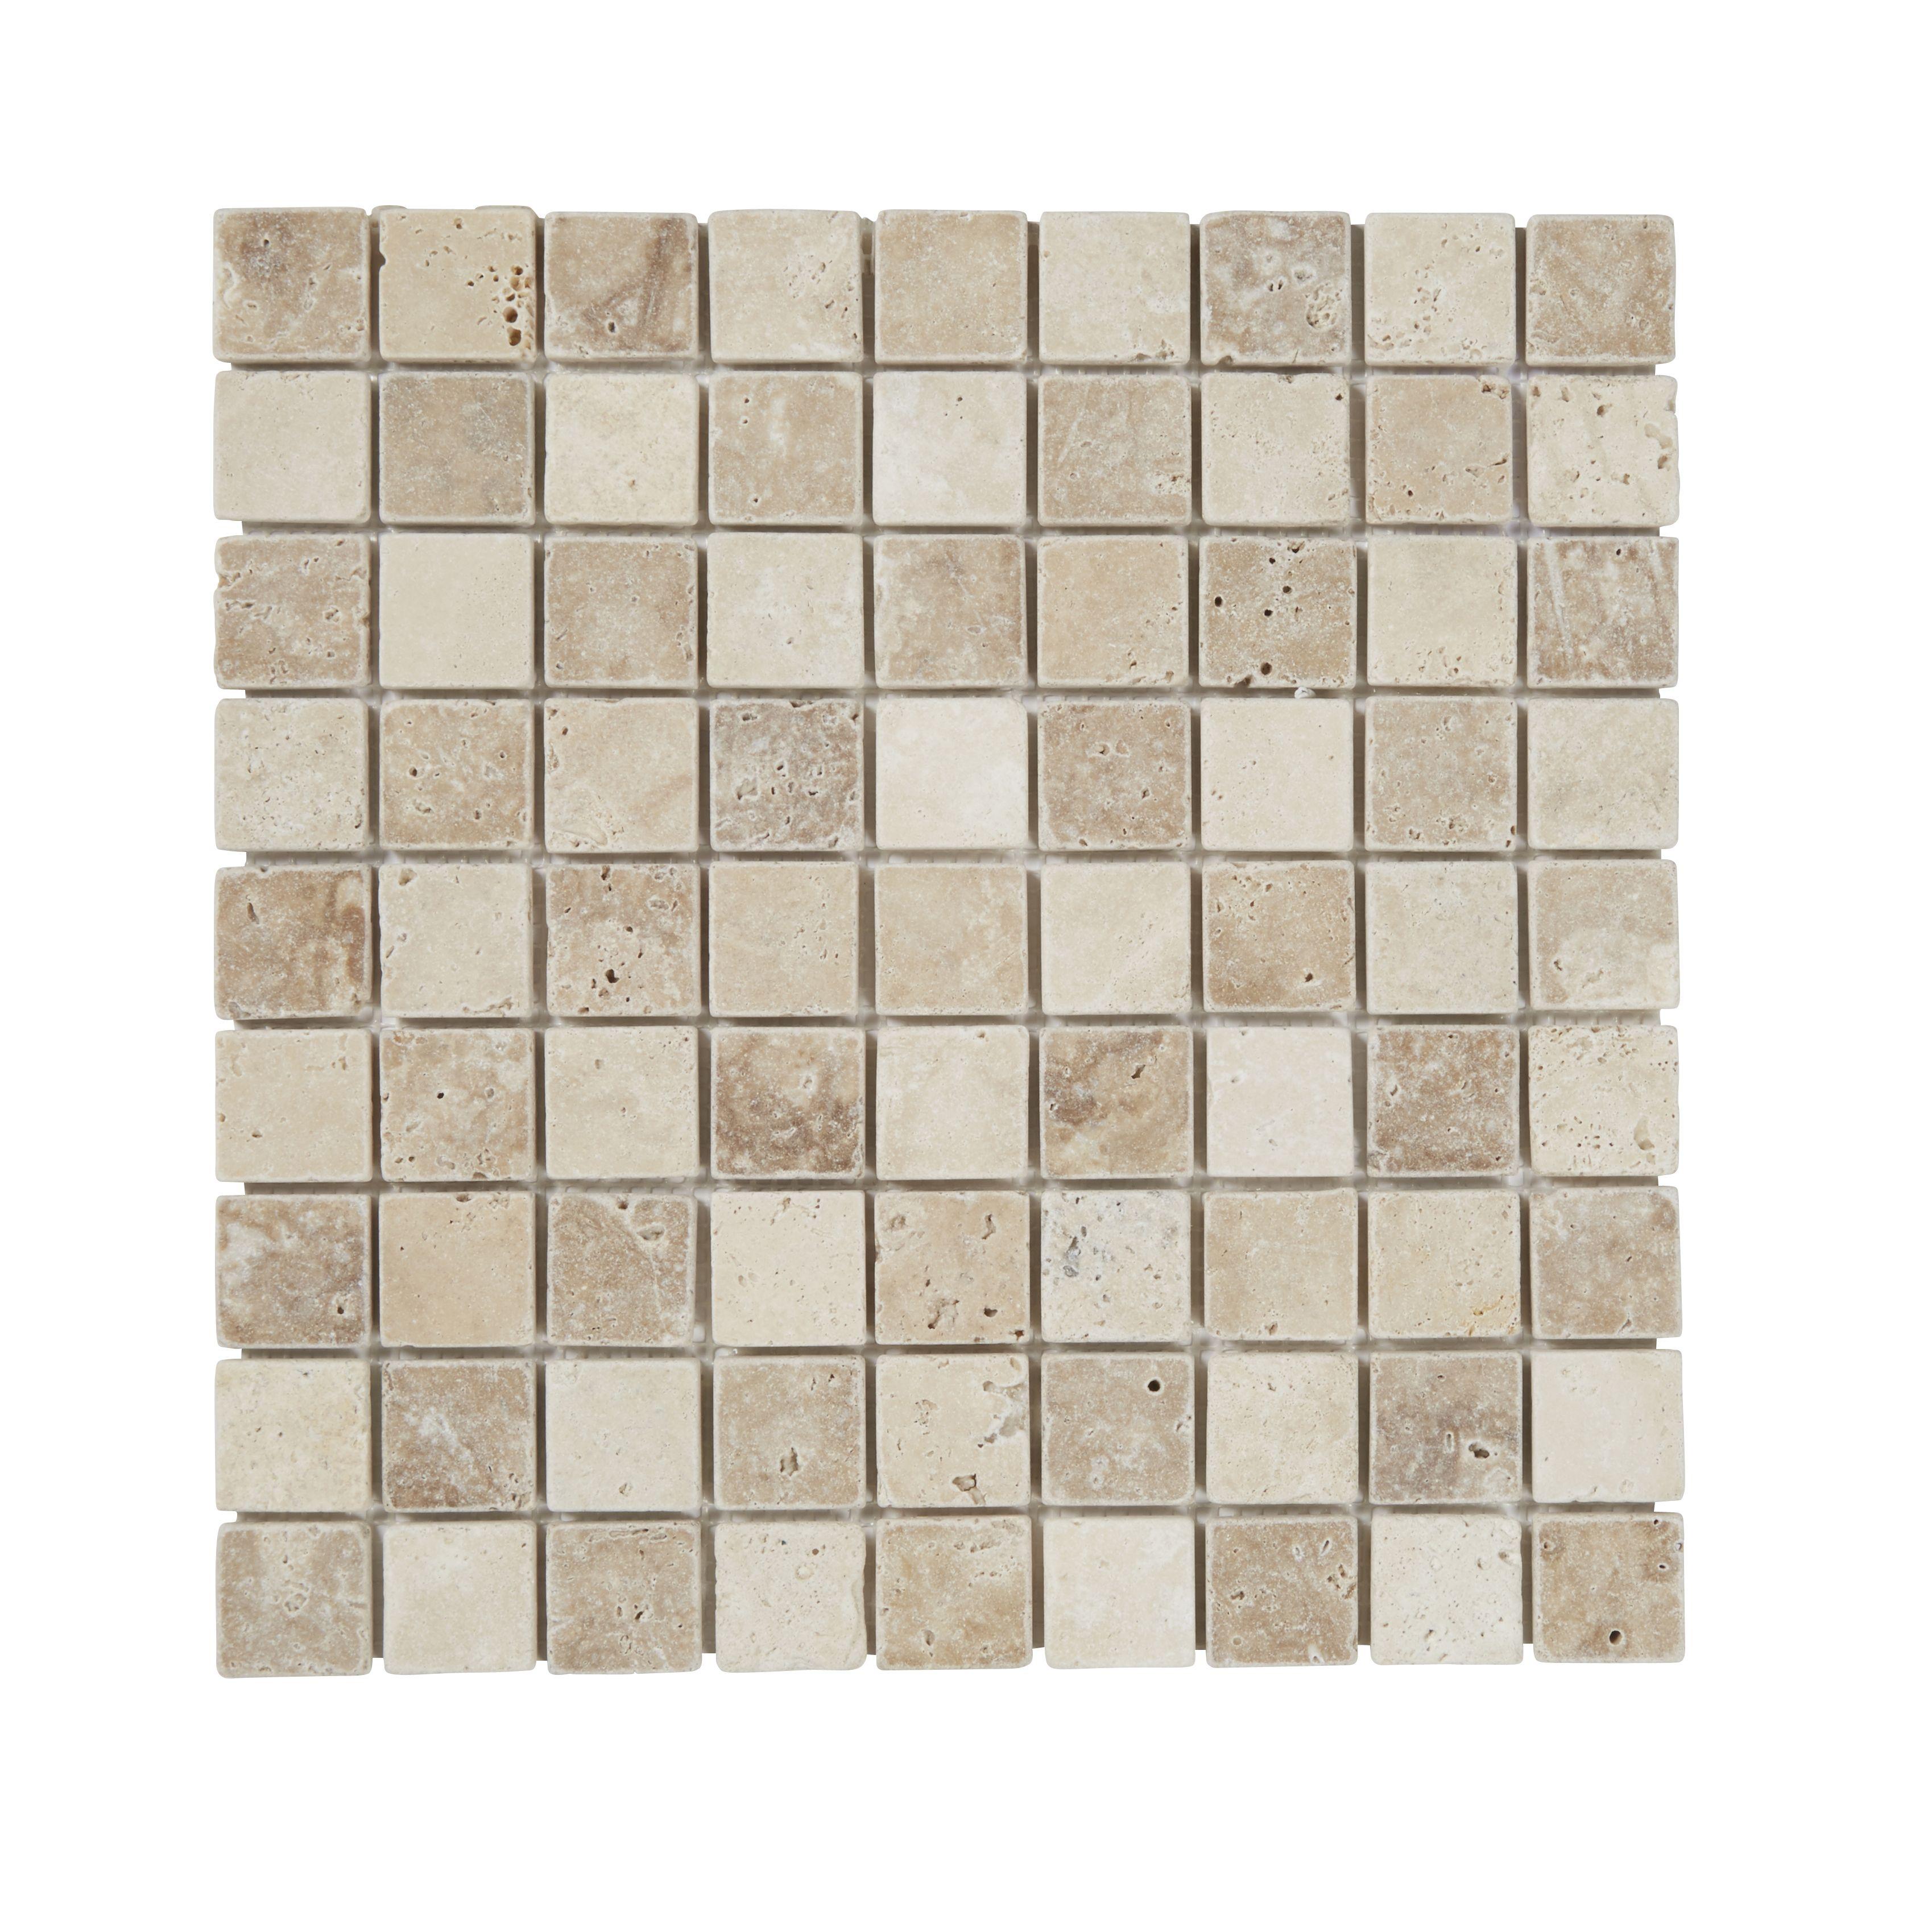 Padoue Beige Travertine Mosaic Tile, (l)300mm (w)300mm